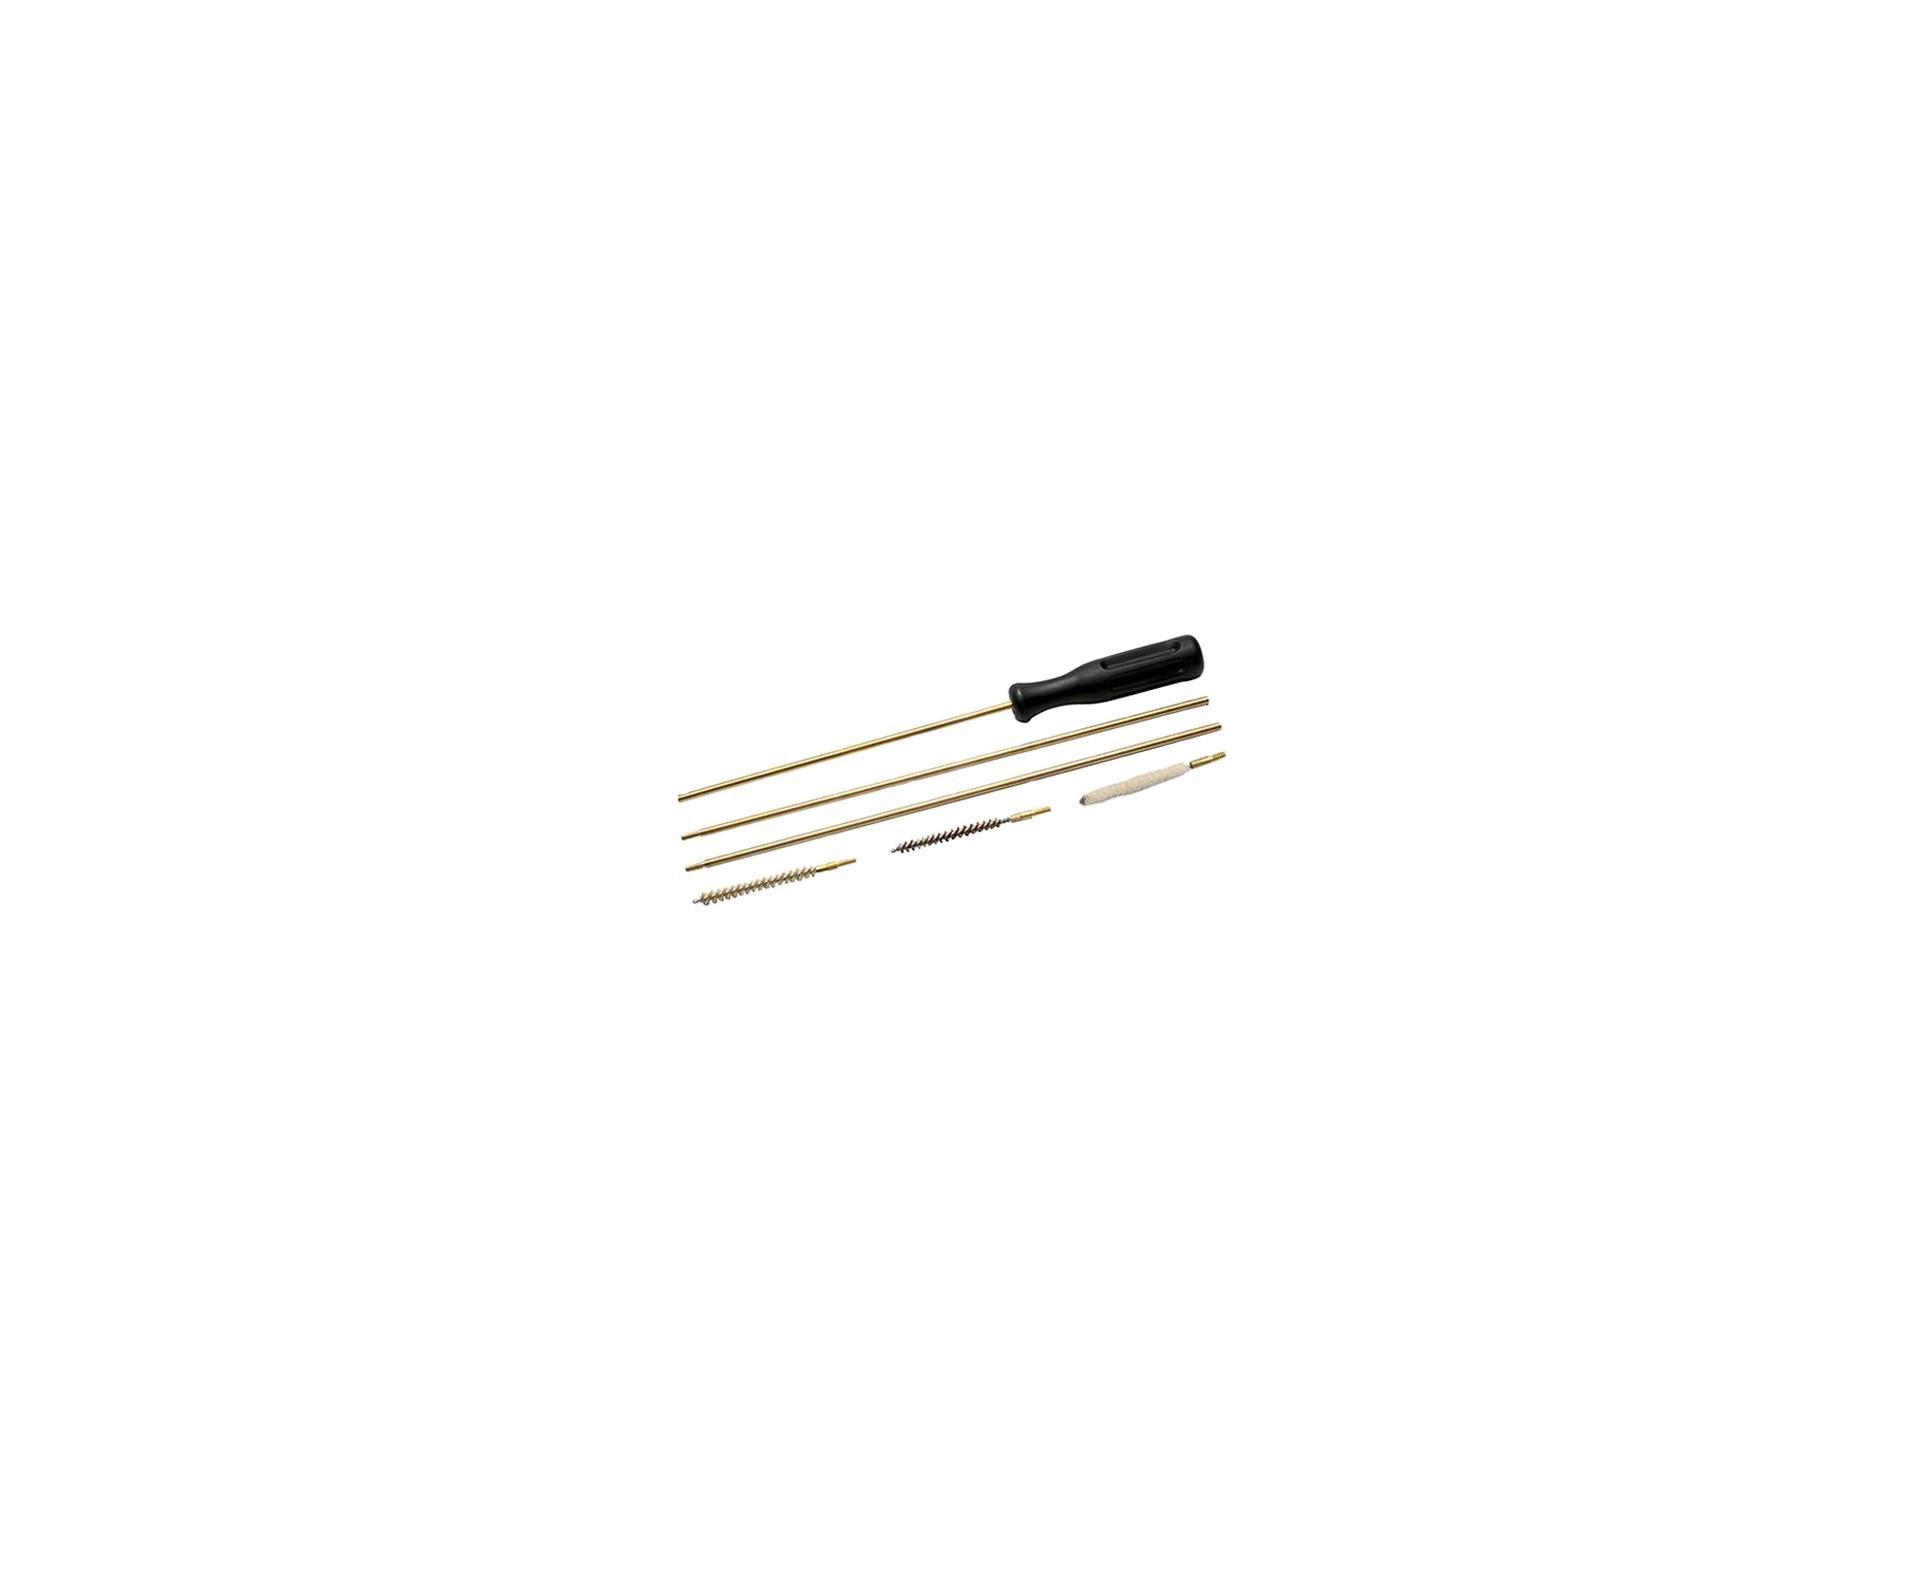 Kit De Limpeza Para Carabina Pressão - Calibre 5,5 Mm - Cbc